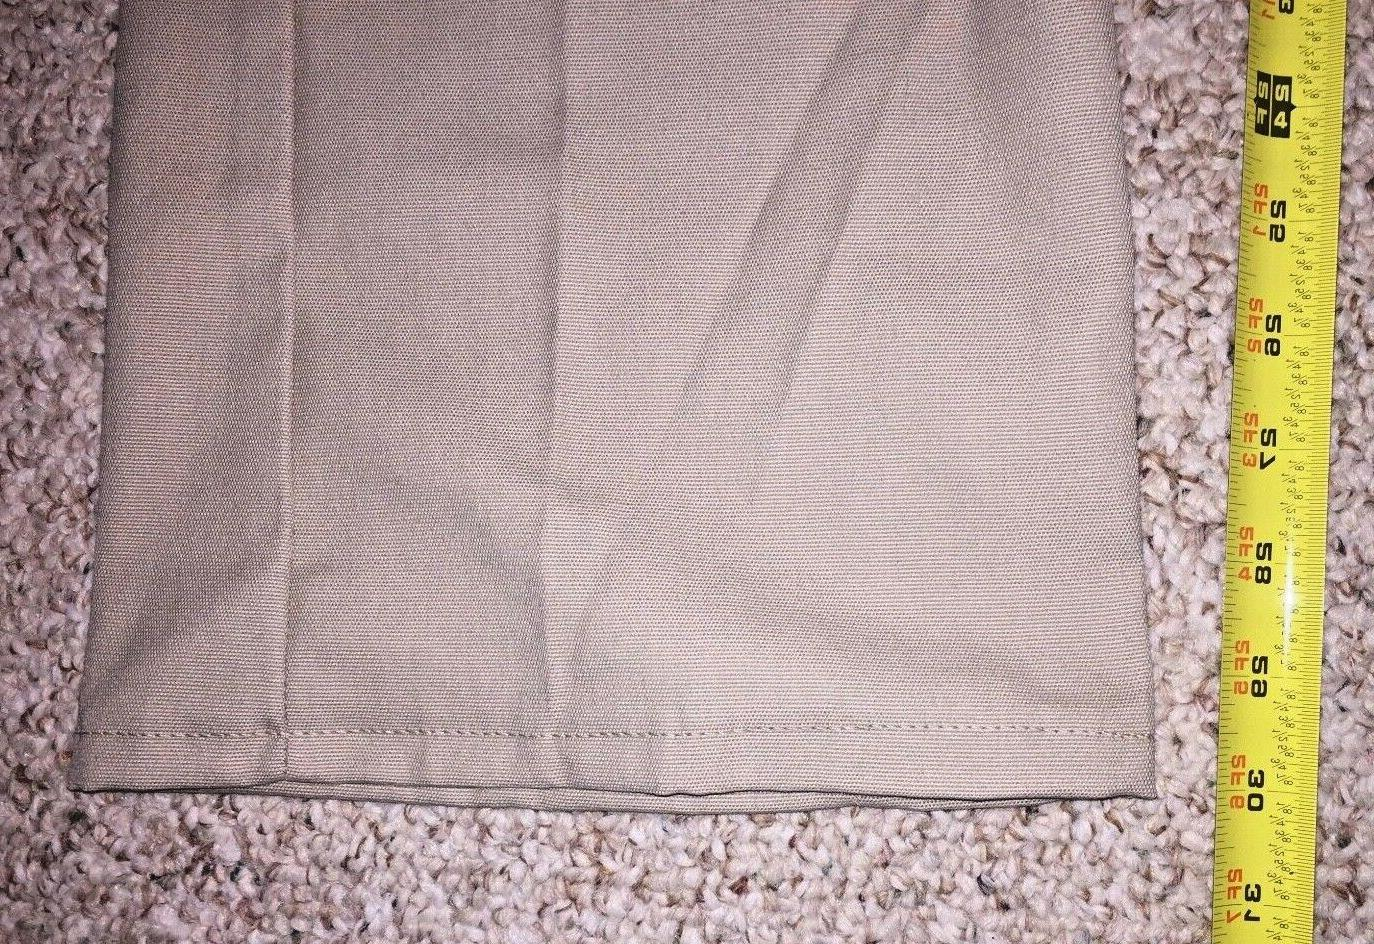 Wrangler Workwear Cargo Work Tan Size with Tags